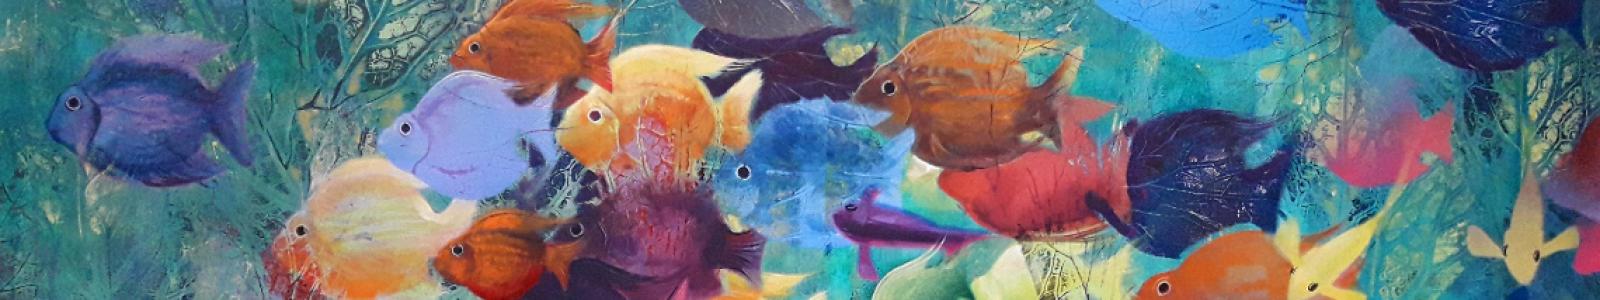 Gallery Painter Sergey Skachkov